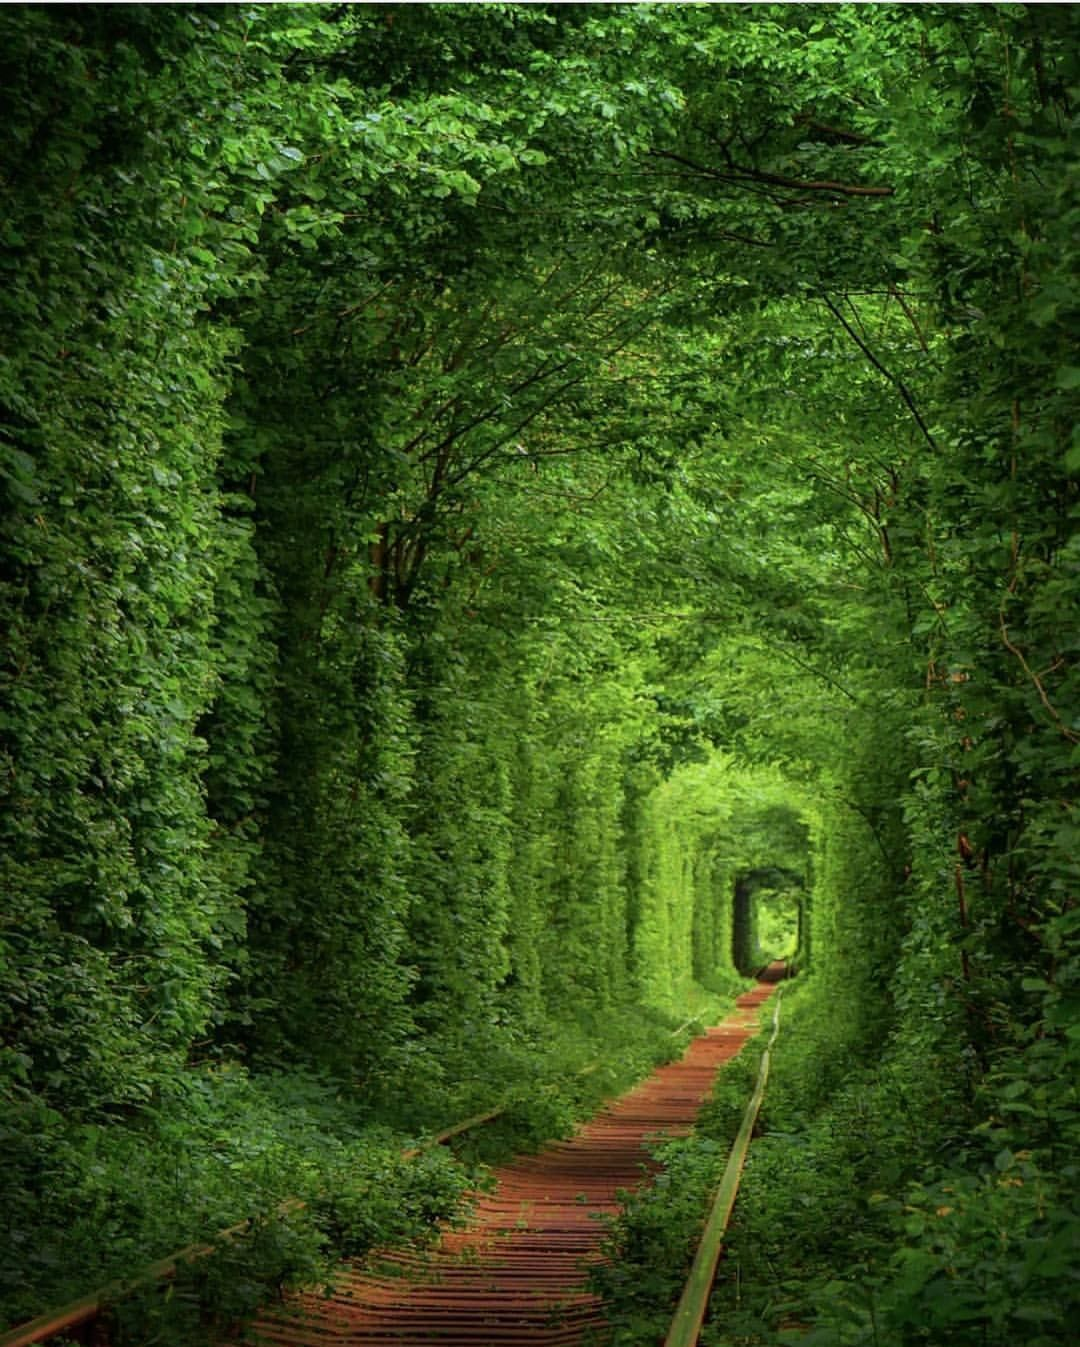 #nature #art #inspiration #country #life  #top #mood #photo #artwork #travel #lifestyle  #magic #photography #natural #movie #art #eco #explore #beautiful #world